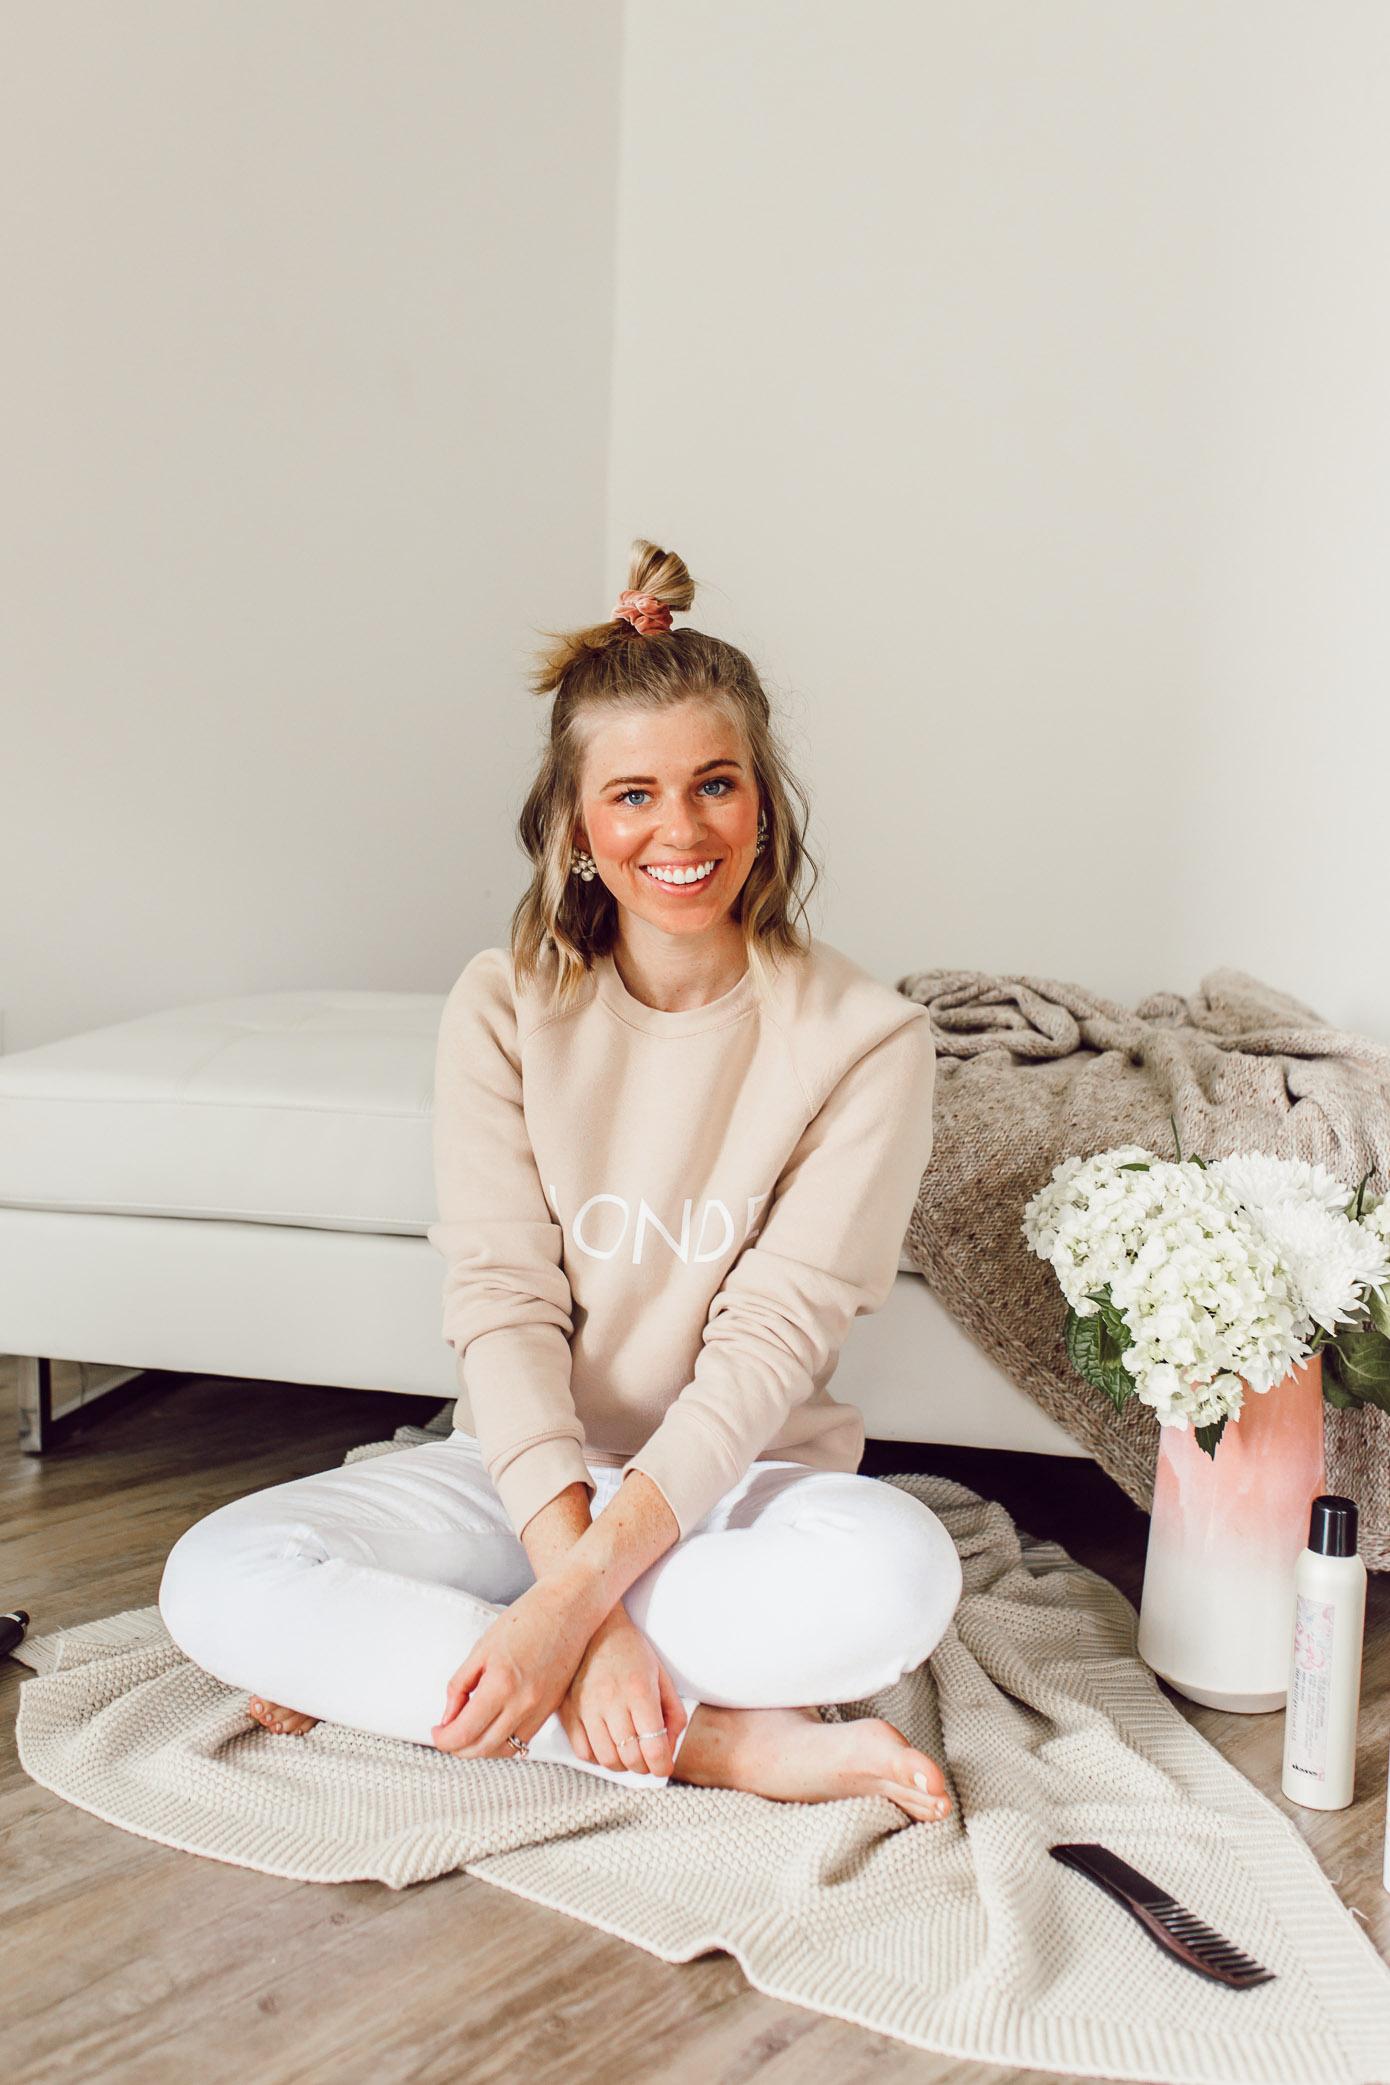 Short Hair Curling Wand Tutorial | Best Curling Wand | Louella Reese